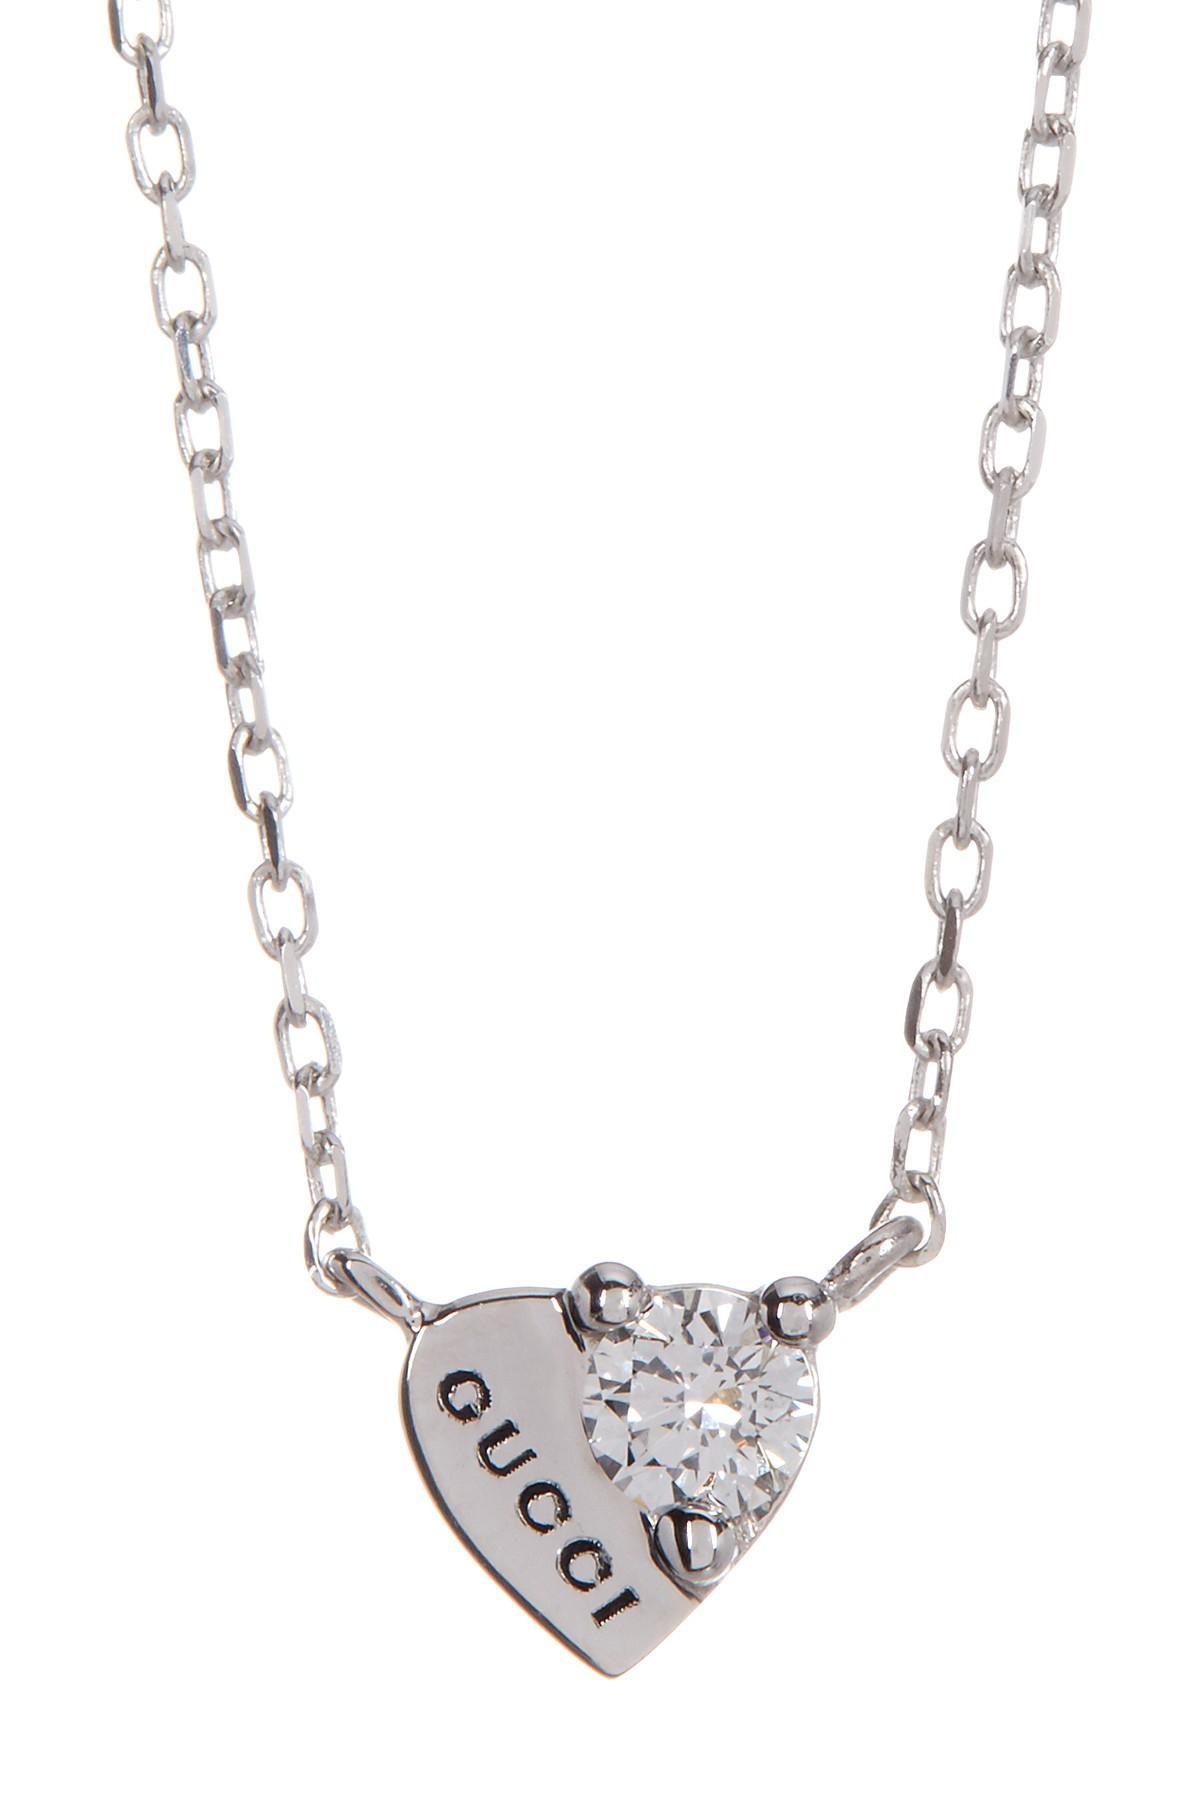 45987a077 Gucci 18k White Gold Trademark Diamond Heart Necklace - Lyst